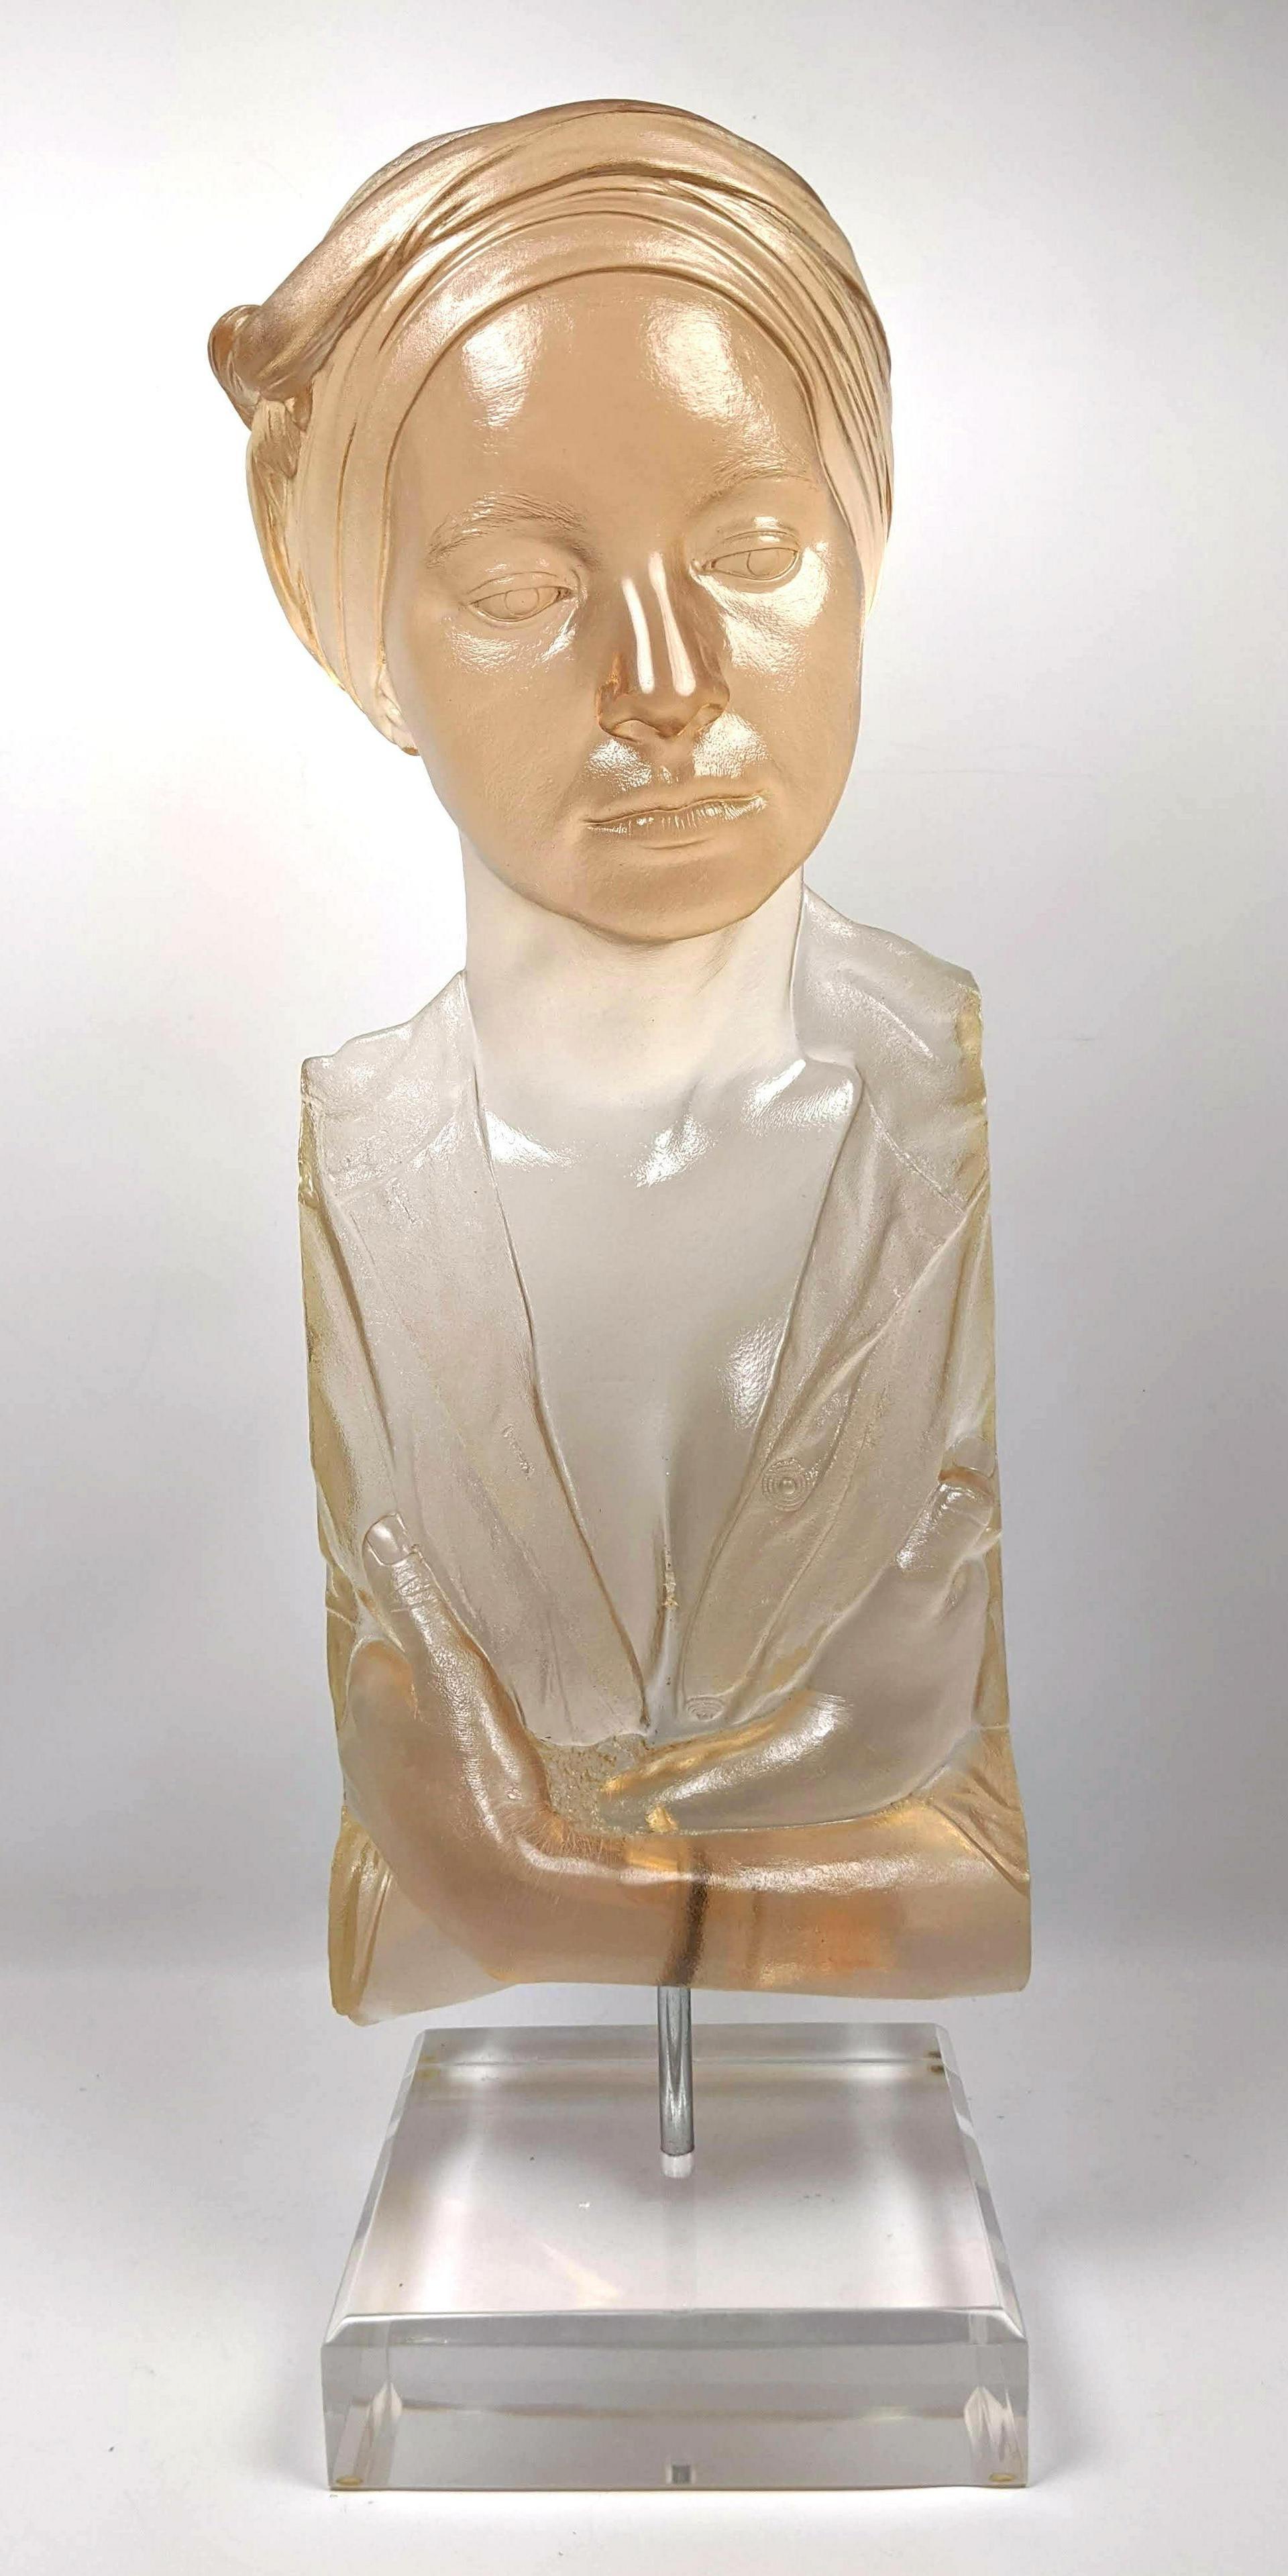 Marc Sijan Hyper Realist Contemporary Cast Acrylic Resin Sculpture Portrait Bust